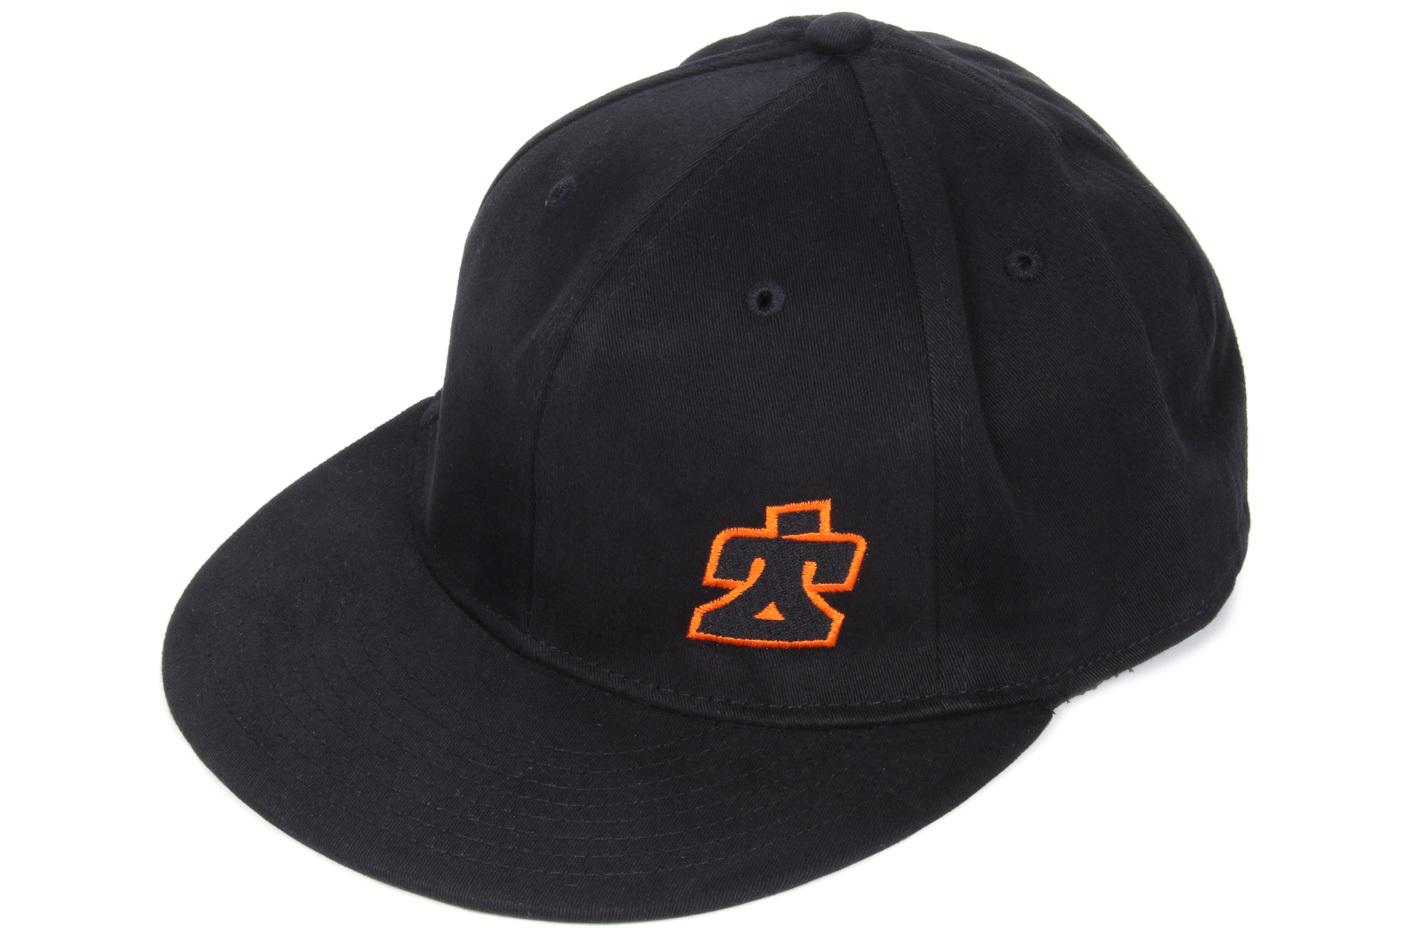 Ti22 Performance Ti22 Flat Bill Hat Black Fitted Large/X-Large